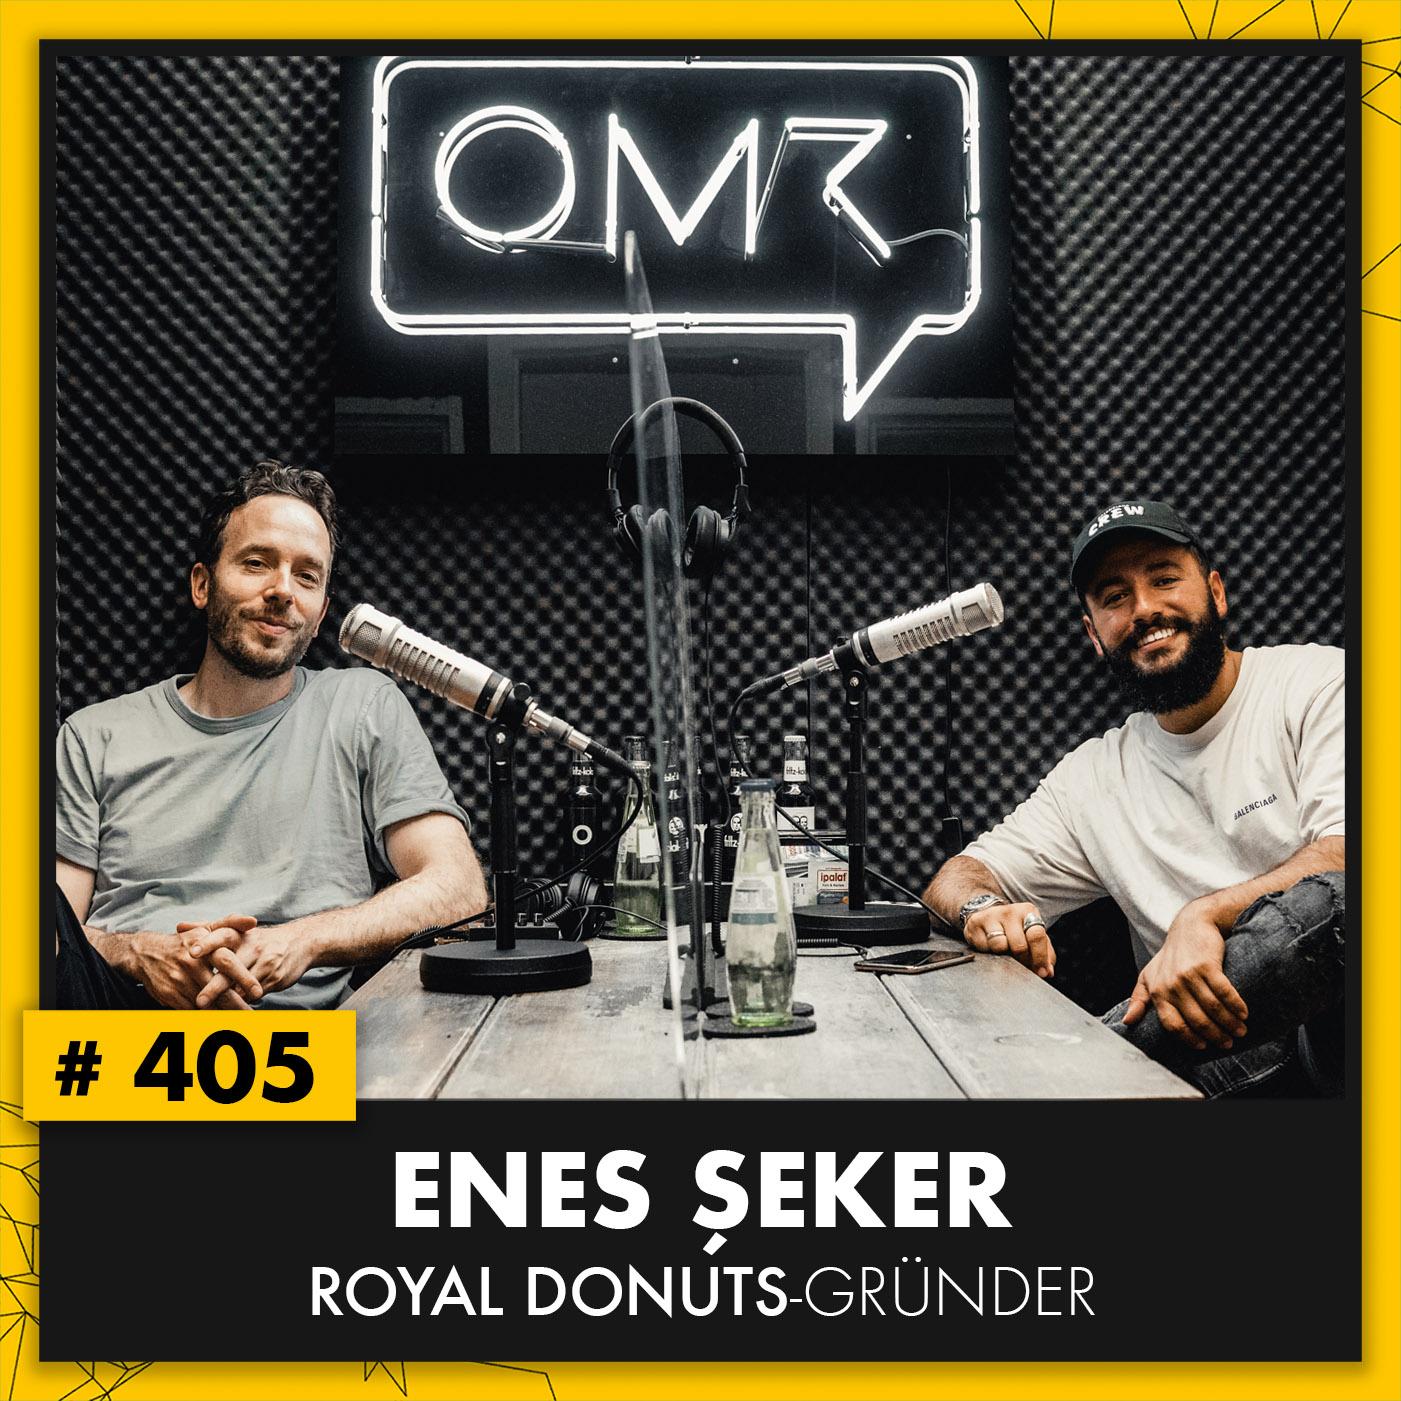 OMR #405 mit dem King of Royal Donuts Enes Seker